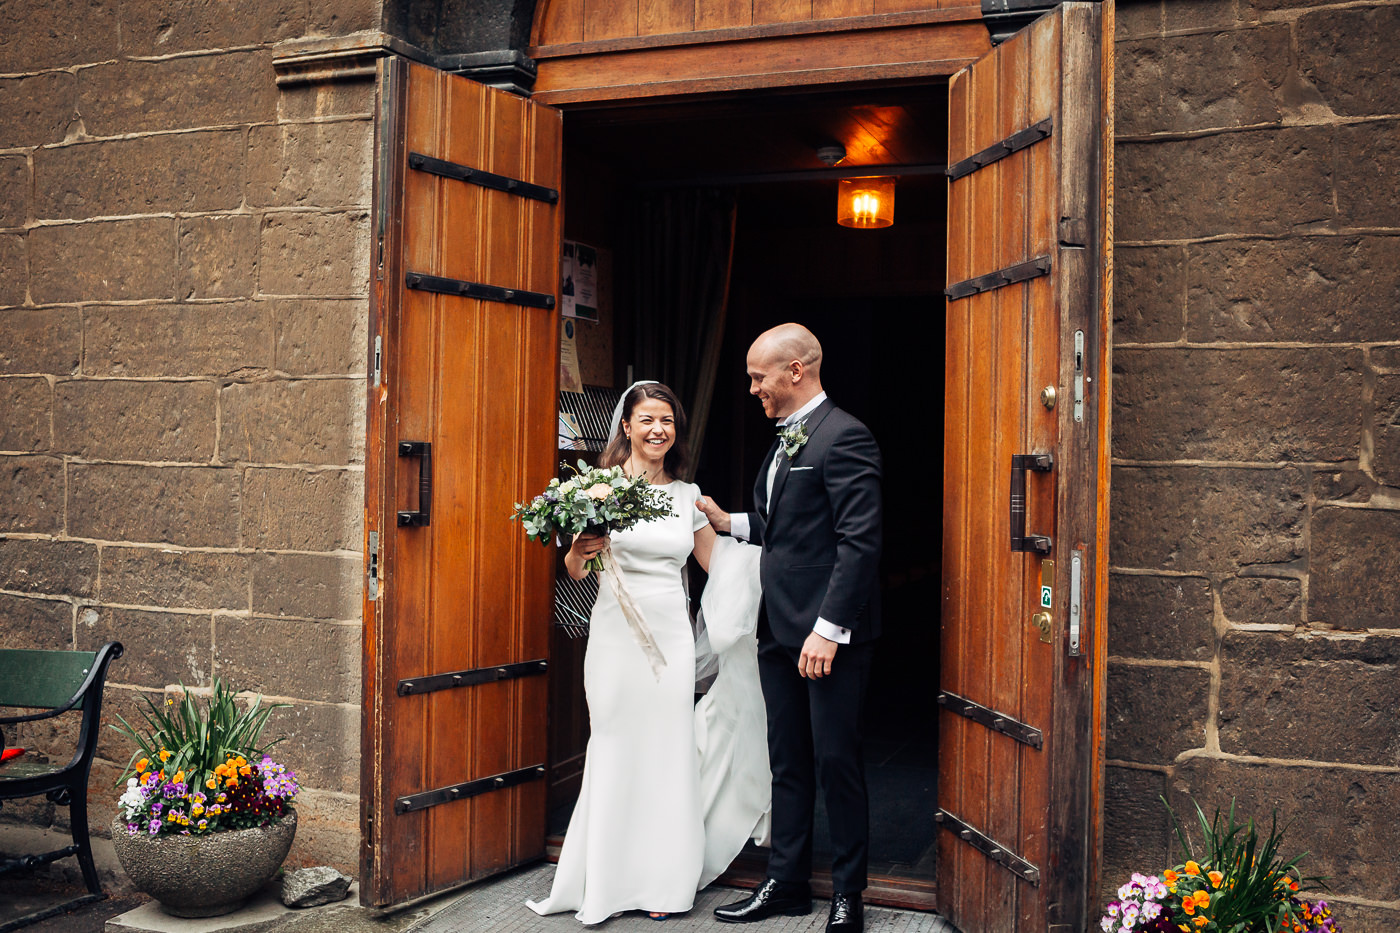 Malene & Ole Martin - elegant dansk- norskt bryllup i Oslo Bryllup Gamle Aker Oslo 46 Akershus